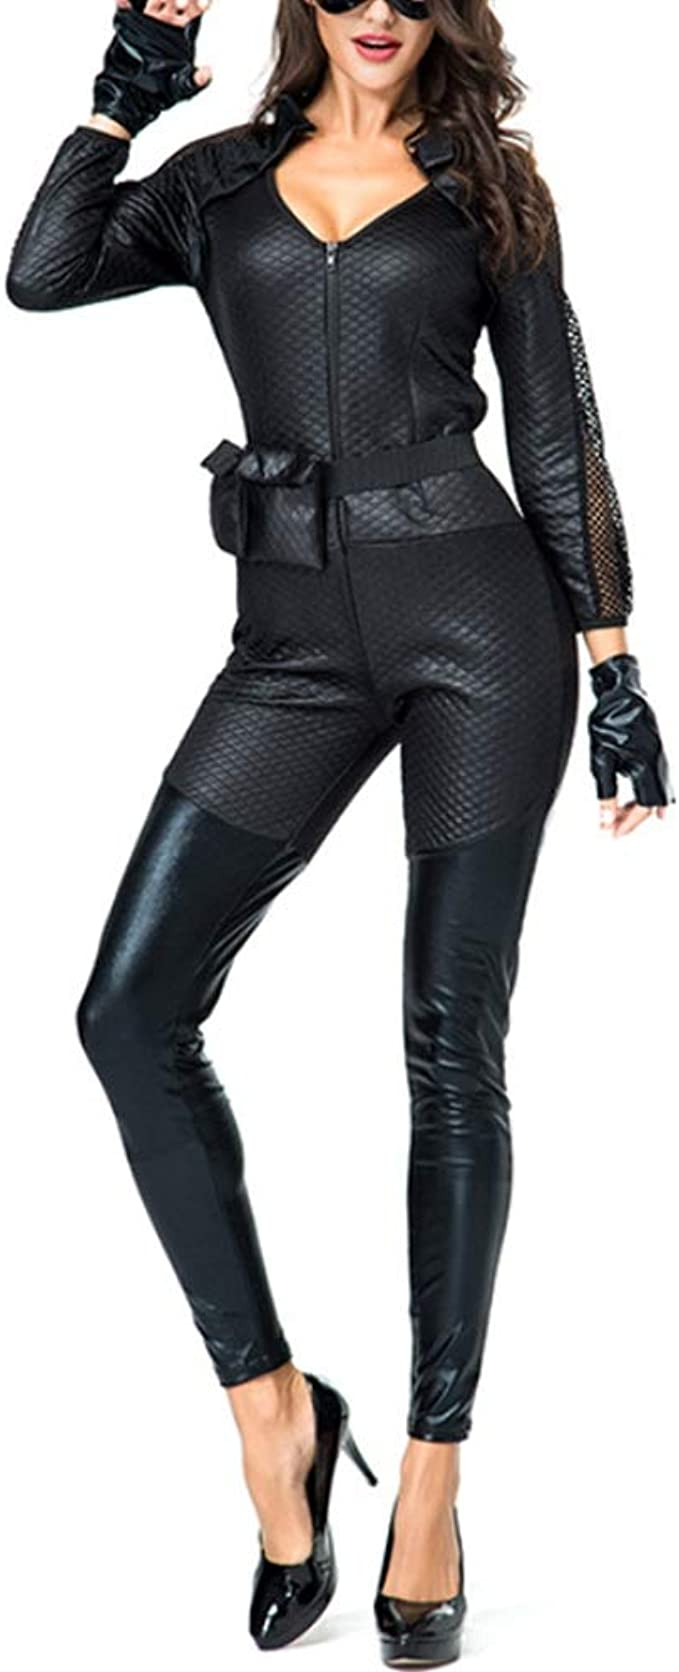 Mitef Fiesta De Halloween Carnival Dark Knight Disfraz De Catwoman ...